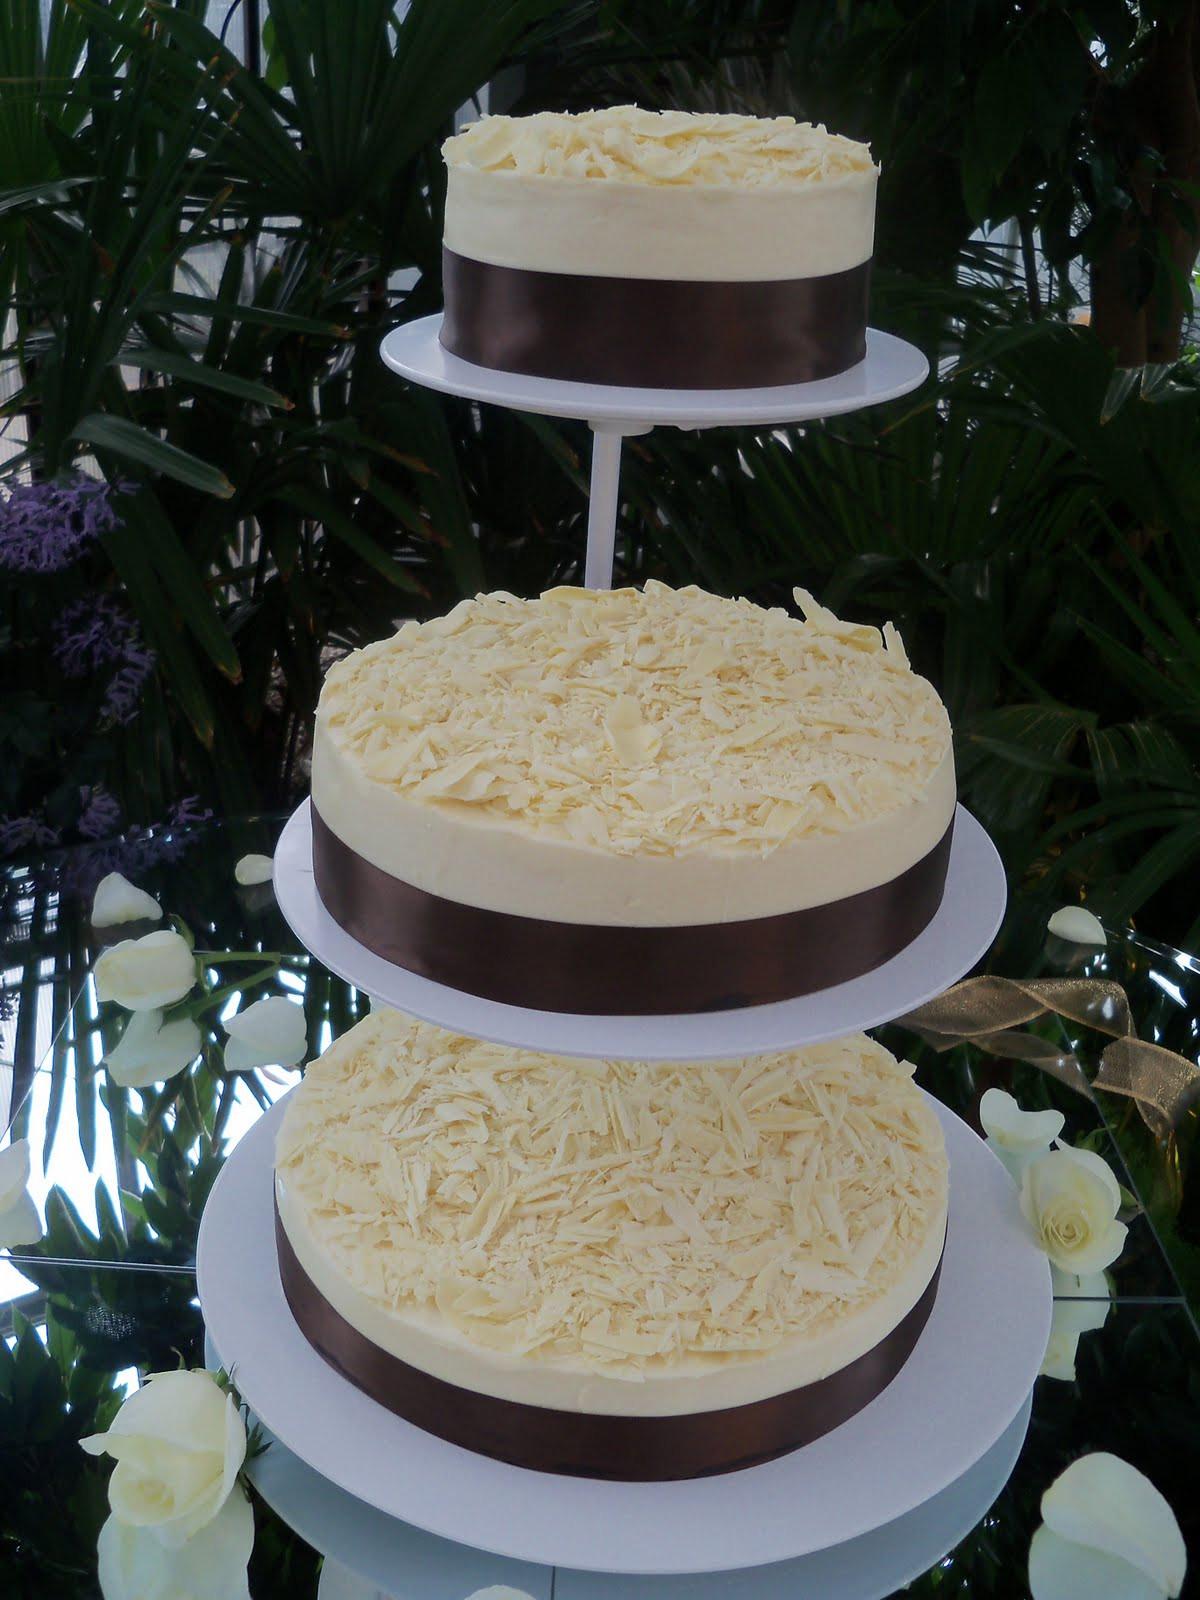 Cheesecake Wedding Cakes  Dede s Cakes Cheesecake Wedding Cake